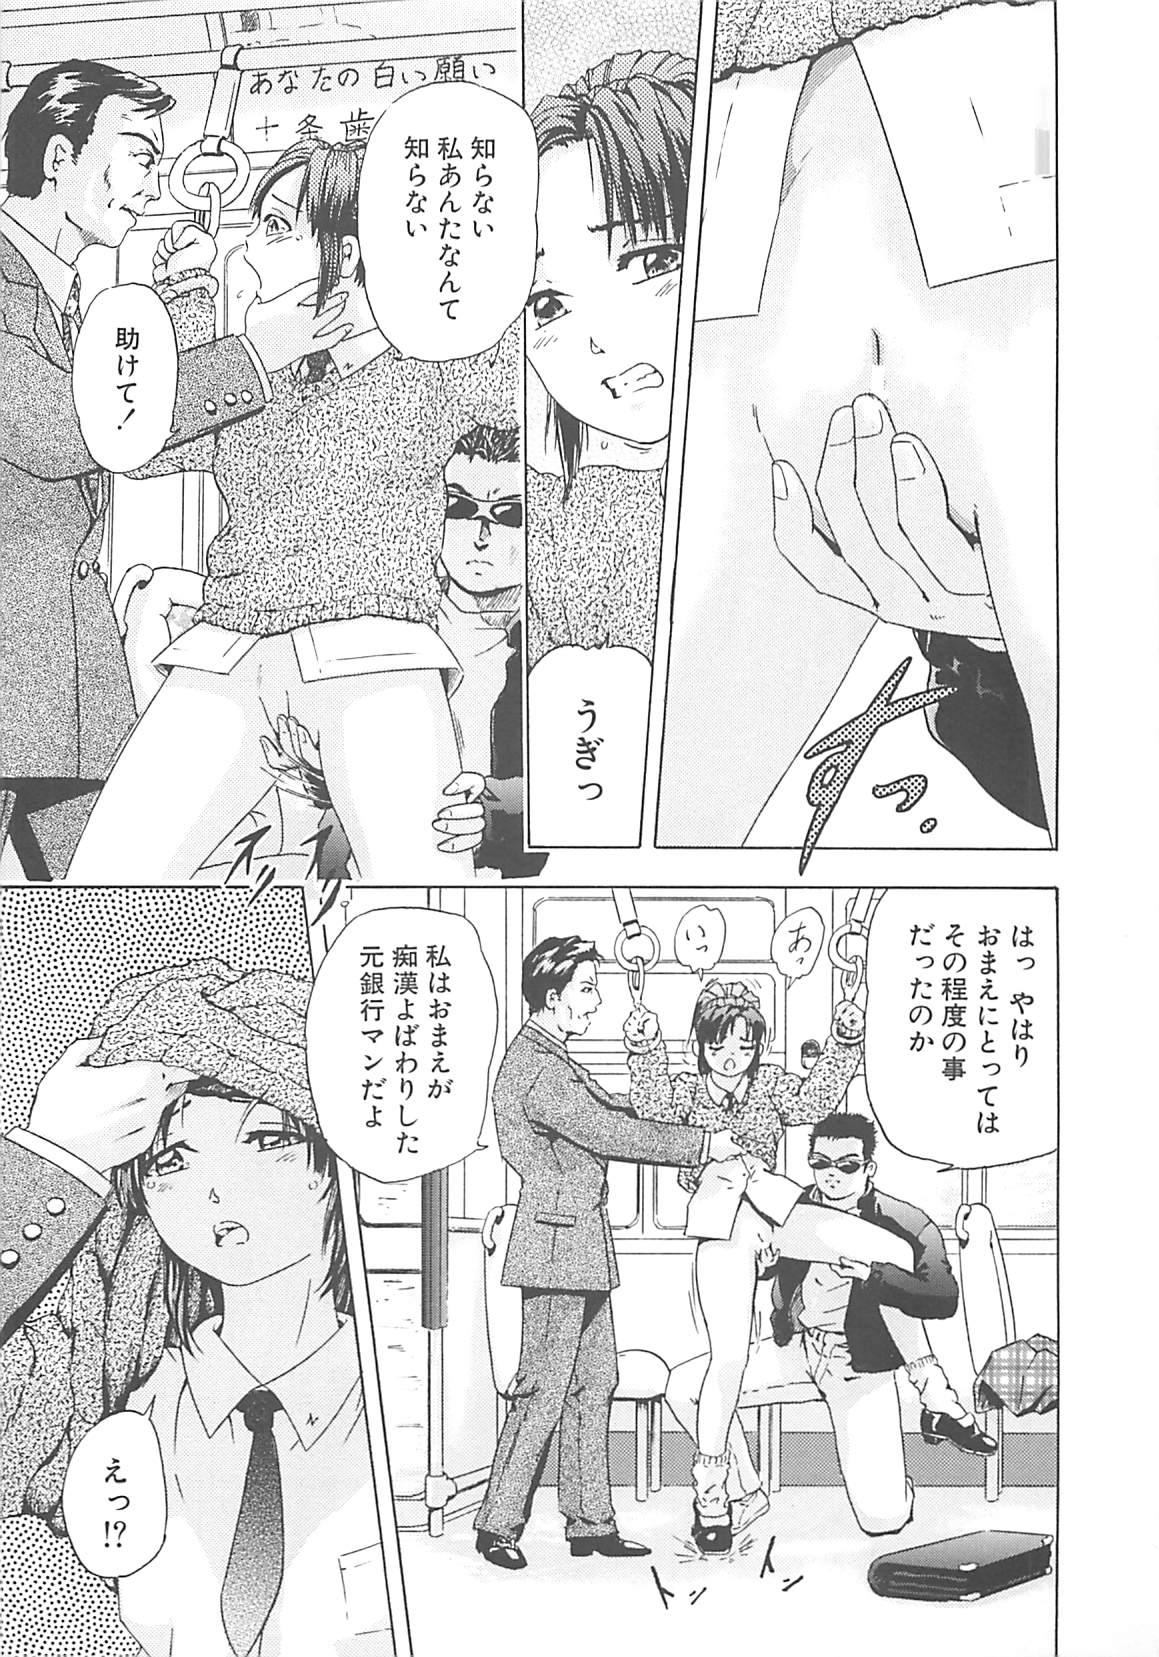 Kanin Kyoushitsu - Adultery Classroom 89